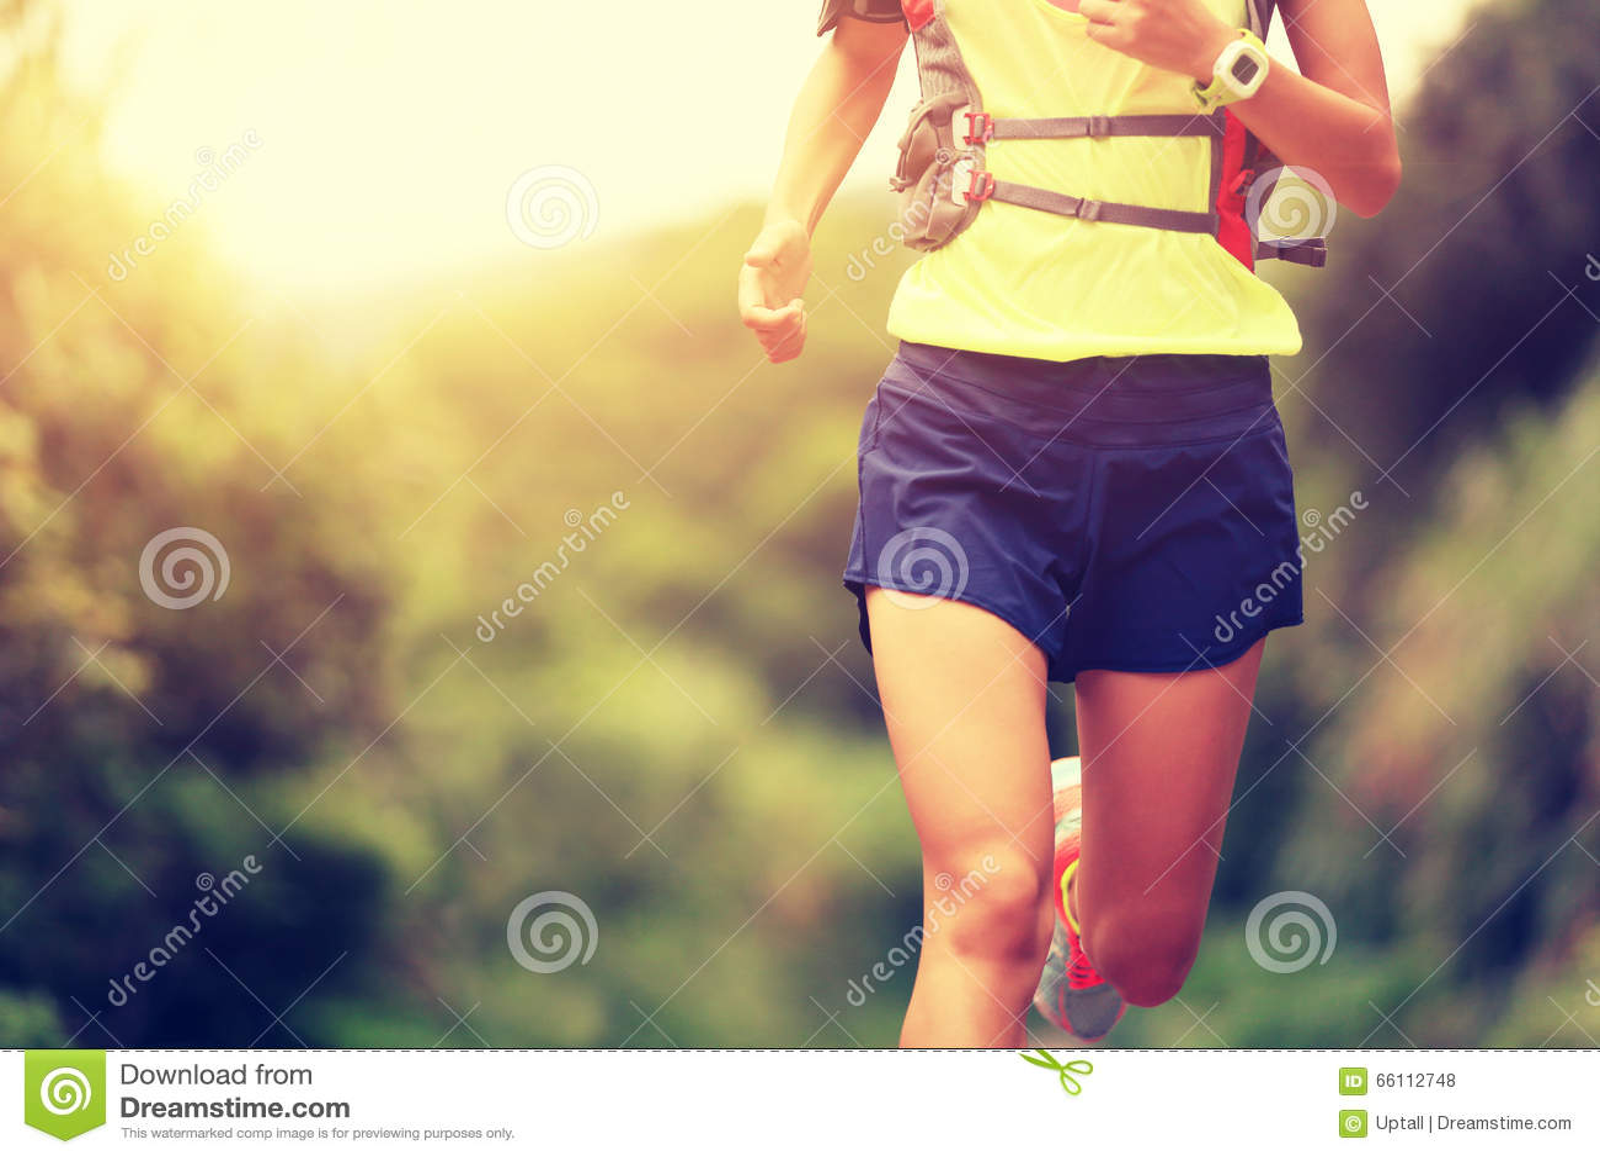 Fitness woman trail runner running on trail